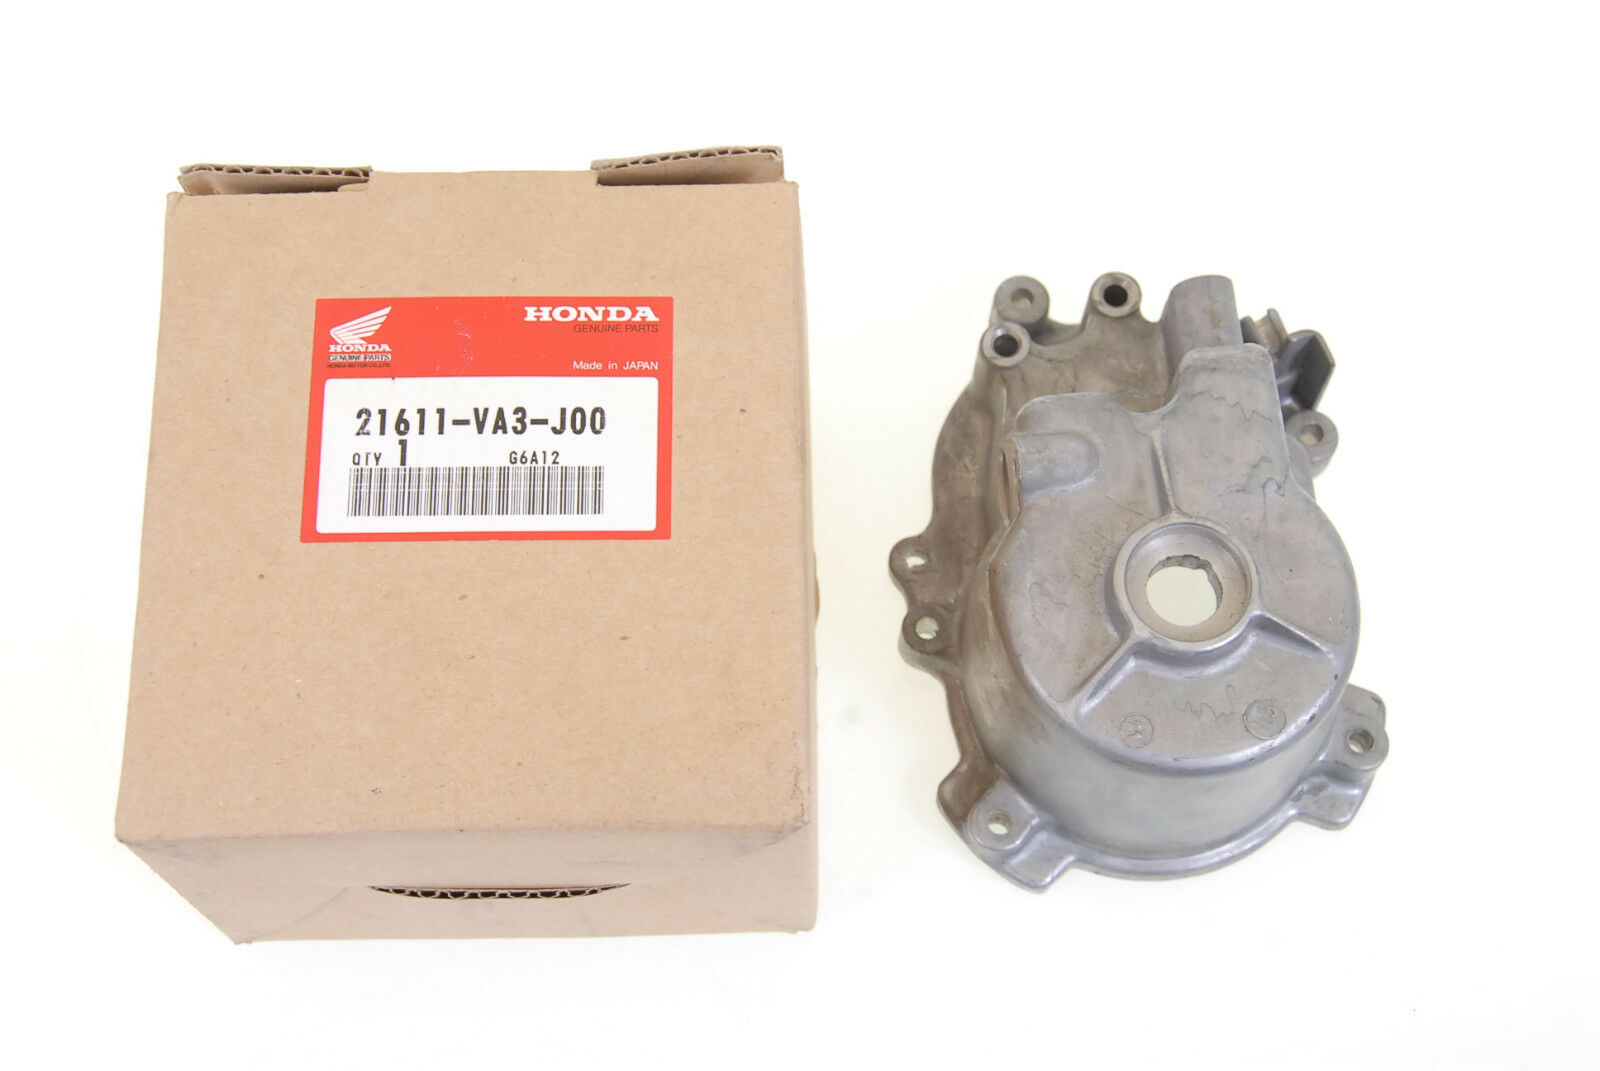 ORIGINALE Honda scatola del cambio 21611-va3-j00 NOS NUOVO  43-43-101